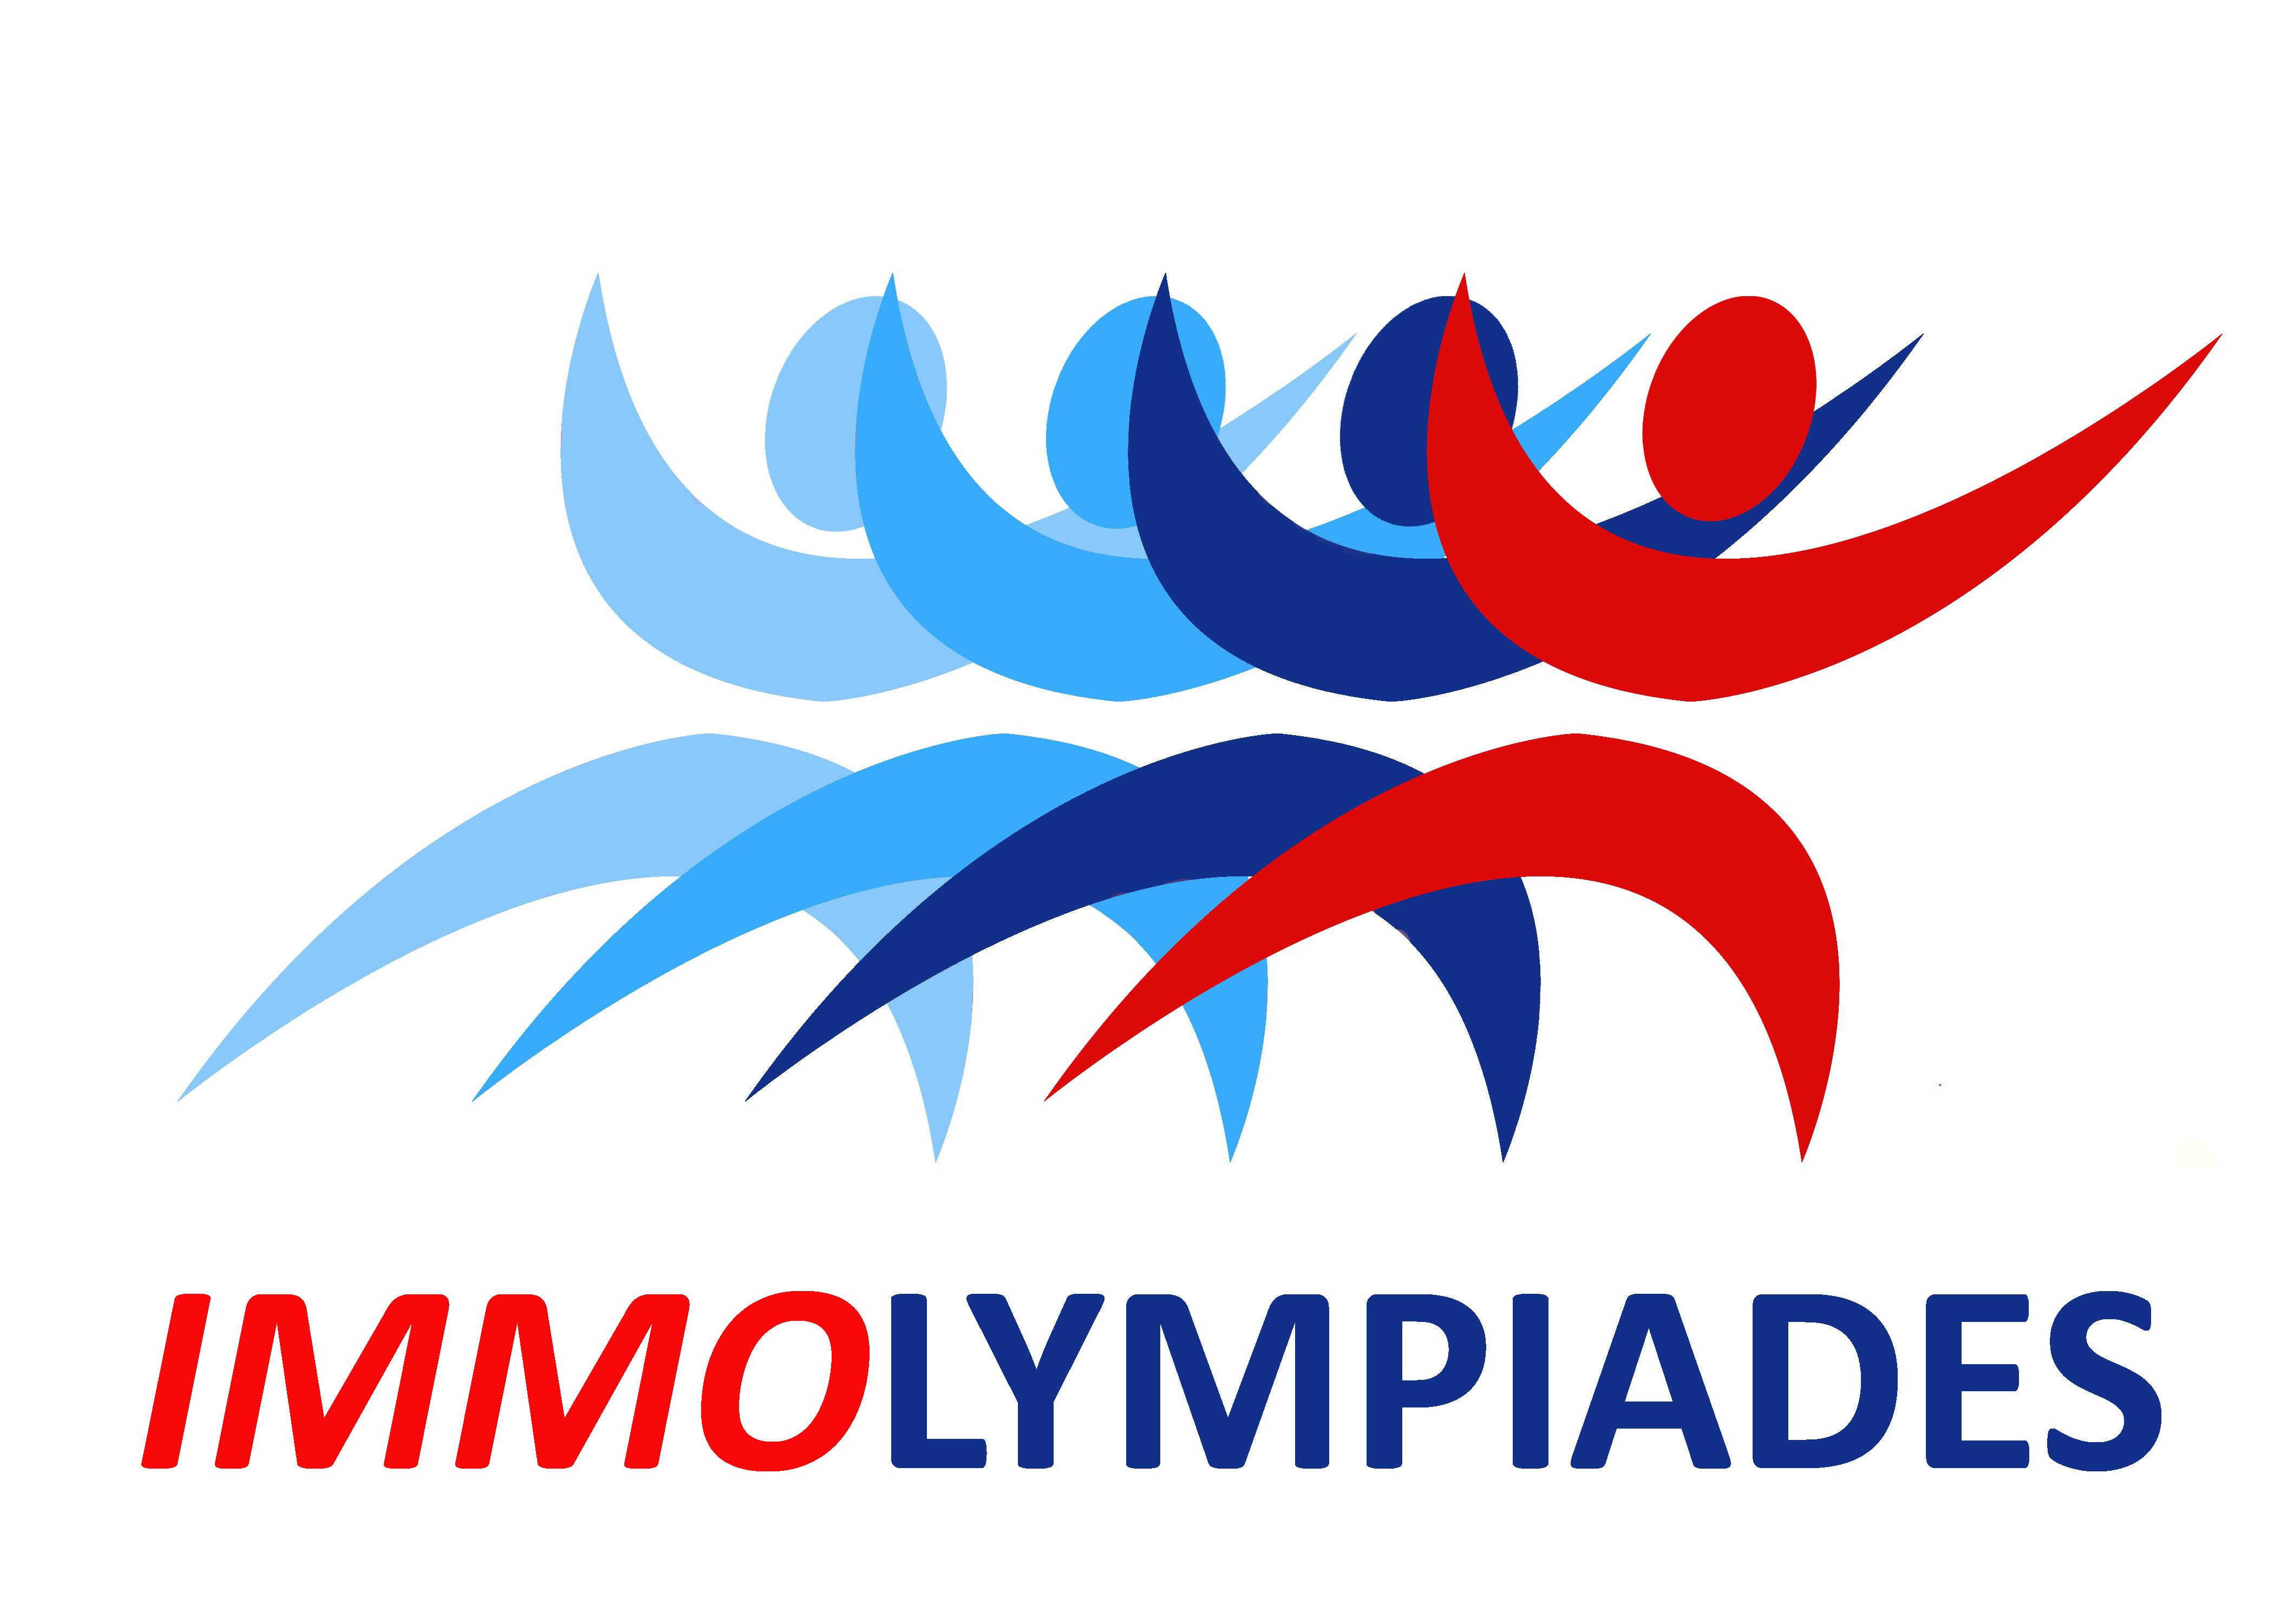 IMMOLYMPIADES